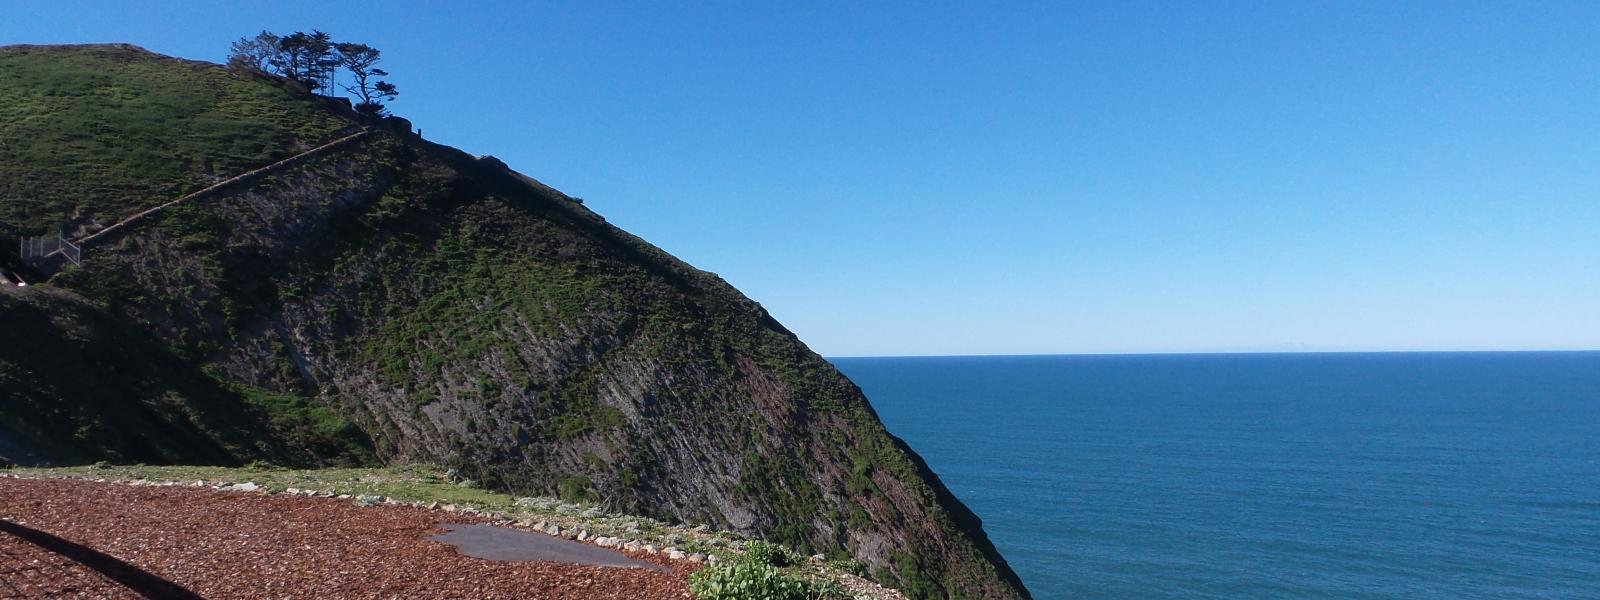 A green coastal hillside and clear blue horizon